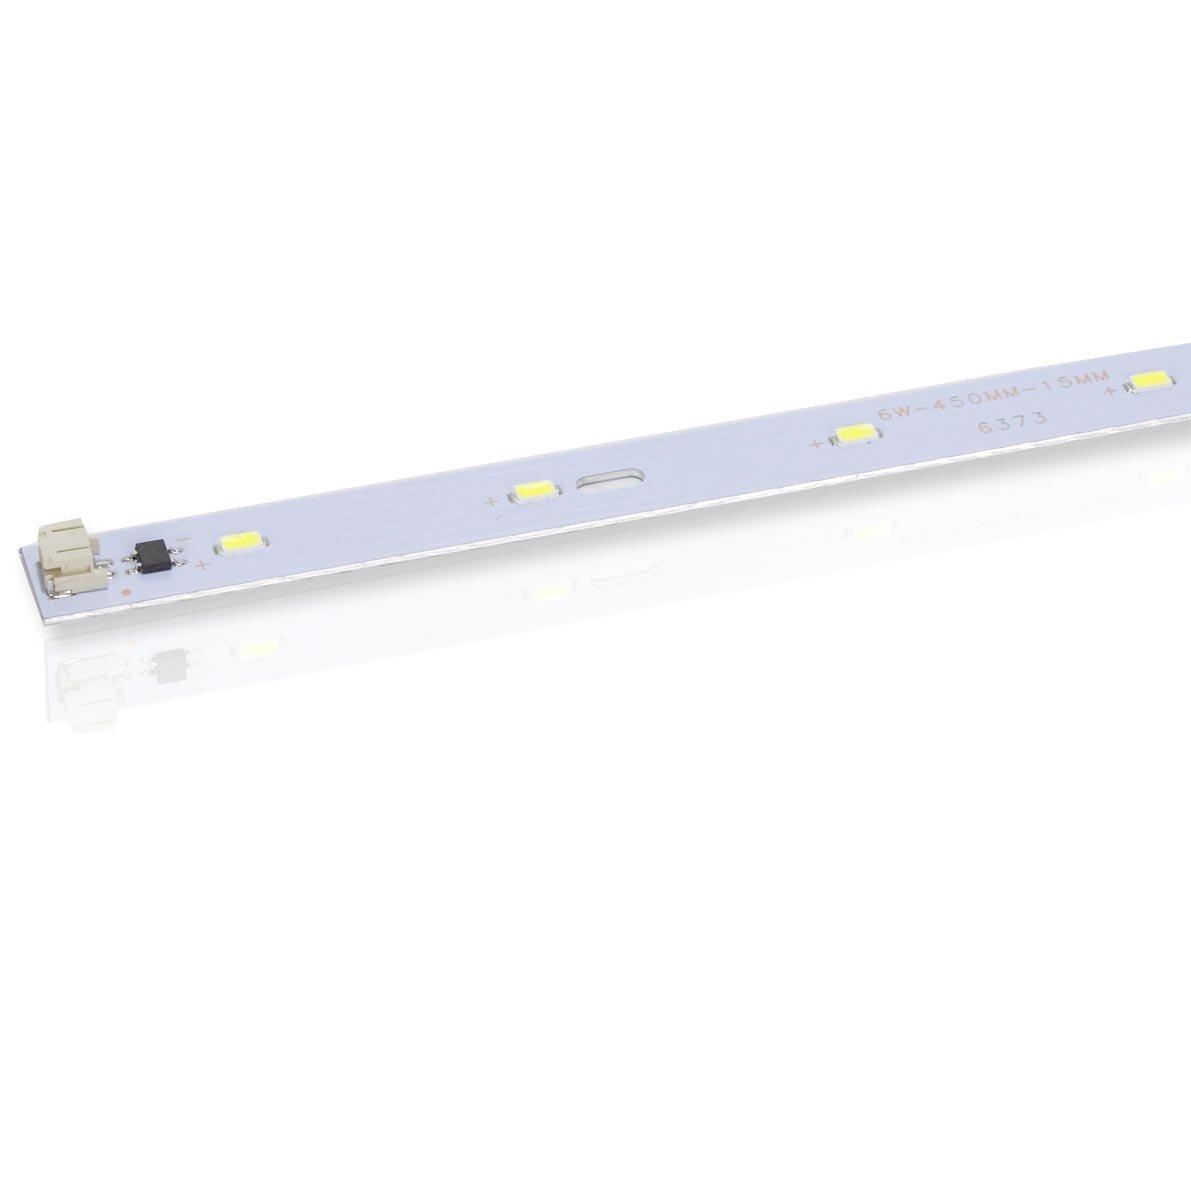 Светодиодная линейка LF-2220 SMD5730, 6W, 11 LED, 220V, 500 lm, 450mm (белый 6000K)